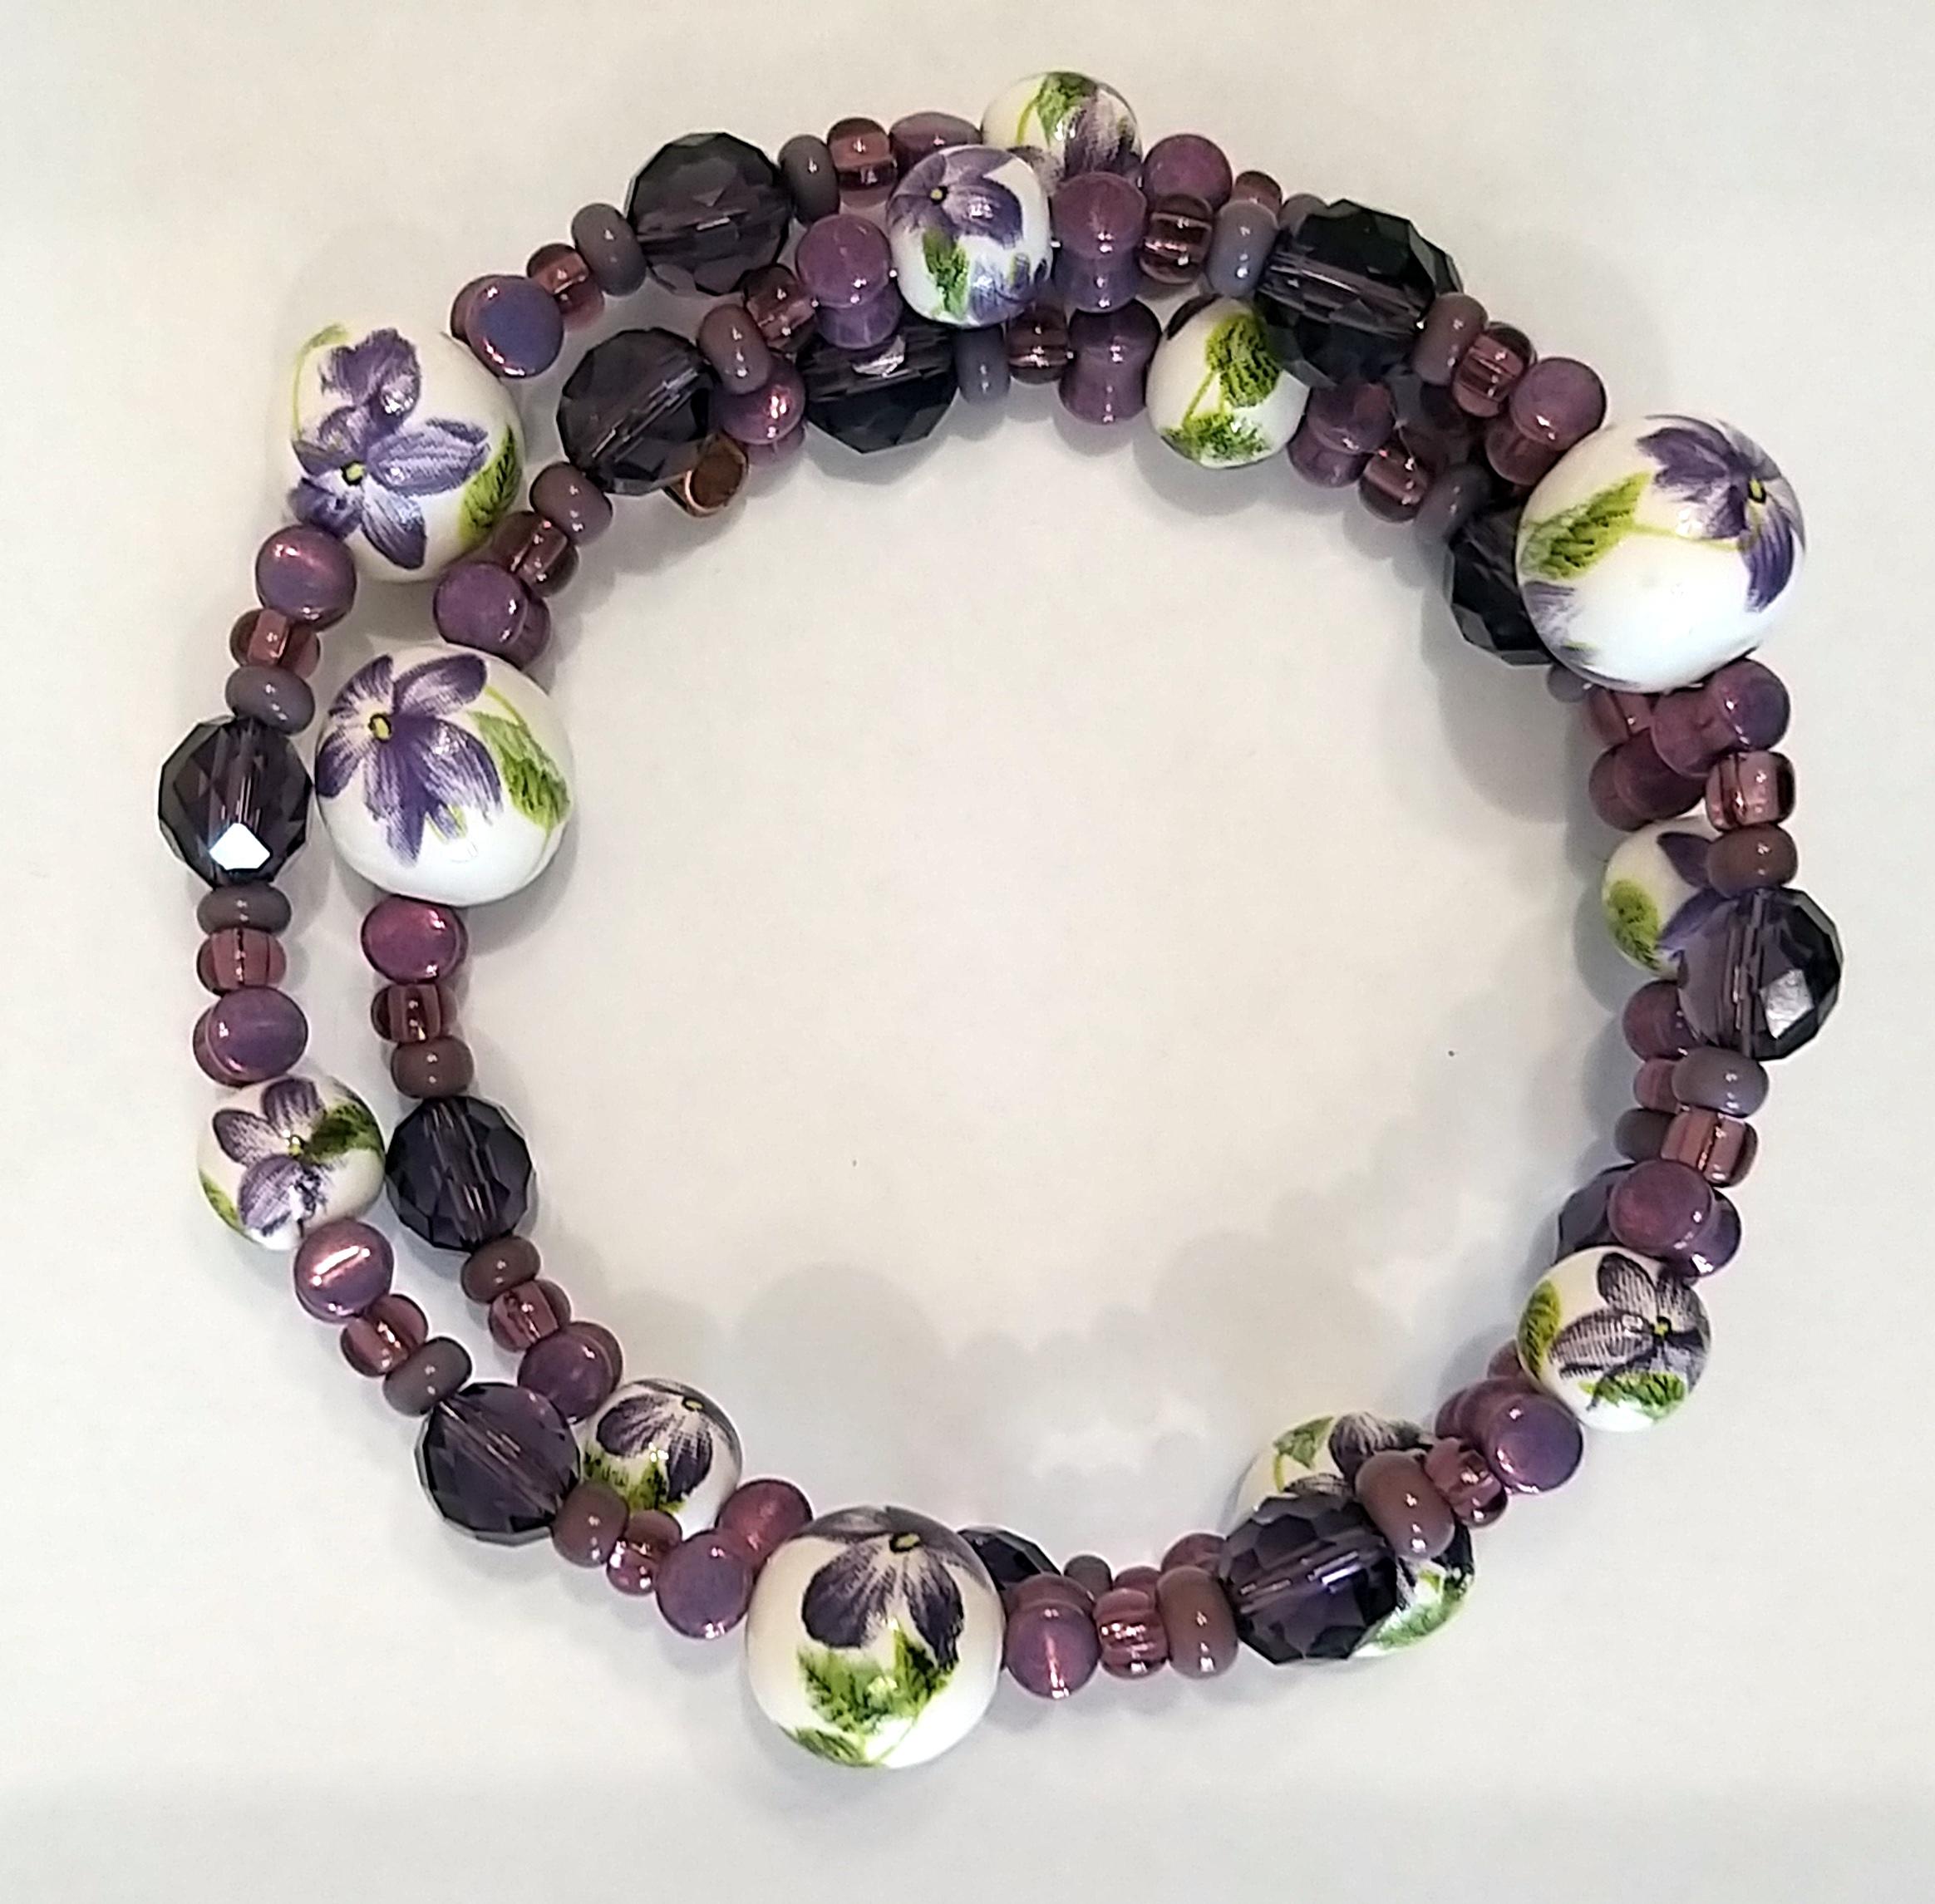 #fp-bn 190816  bracelet OR necklace   suggested $25 usD